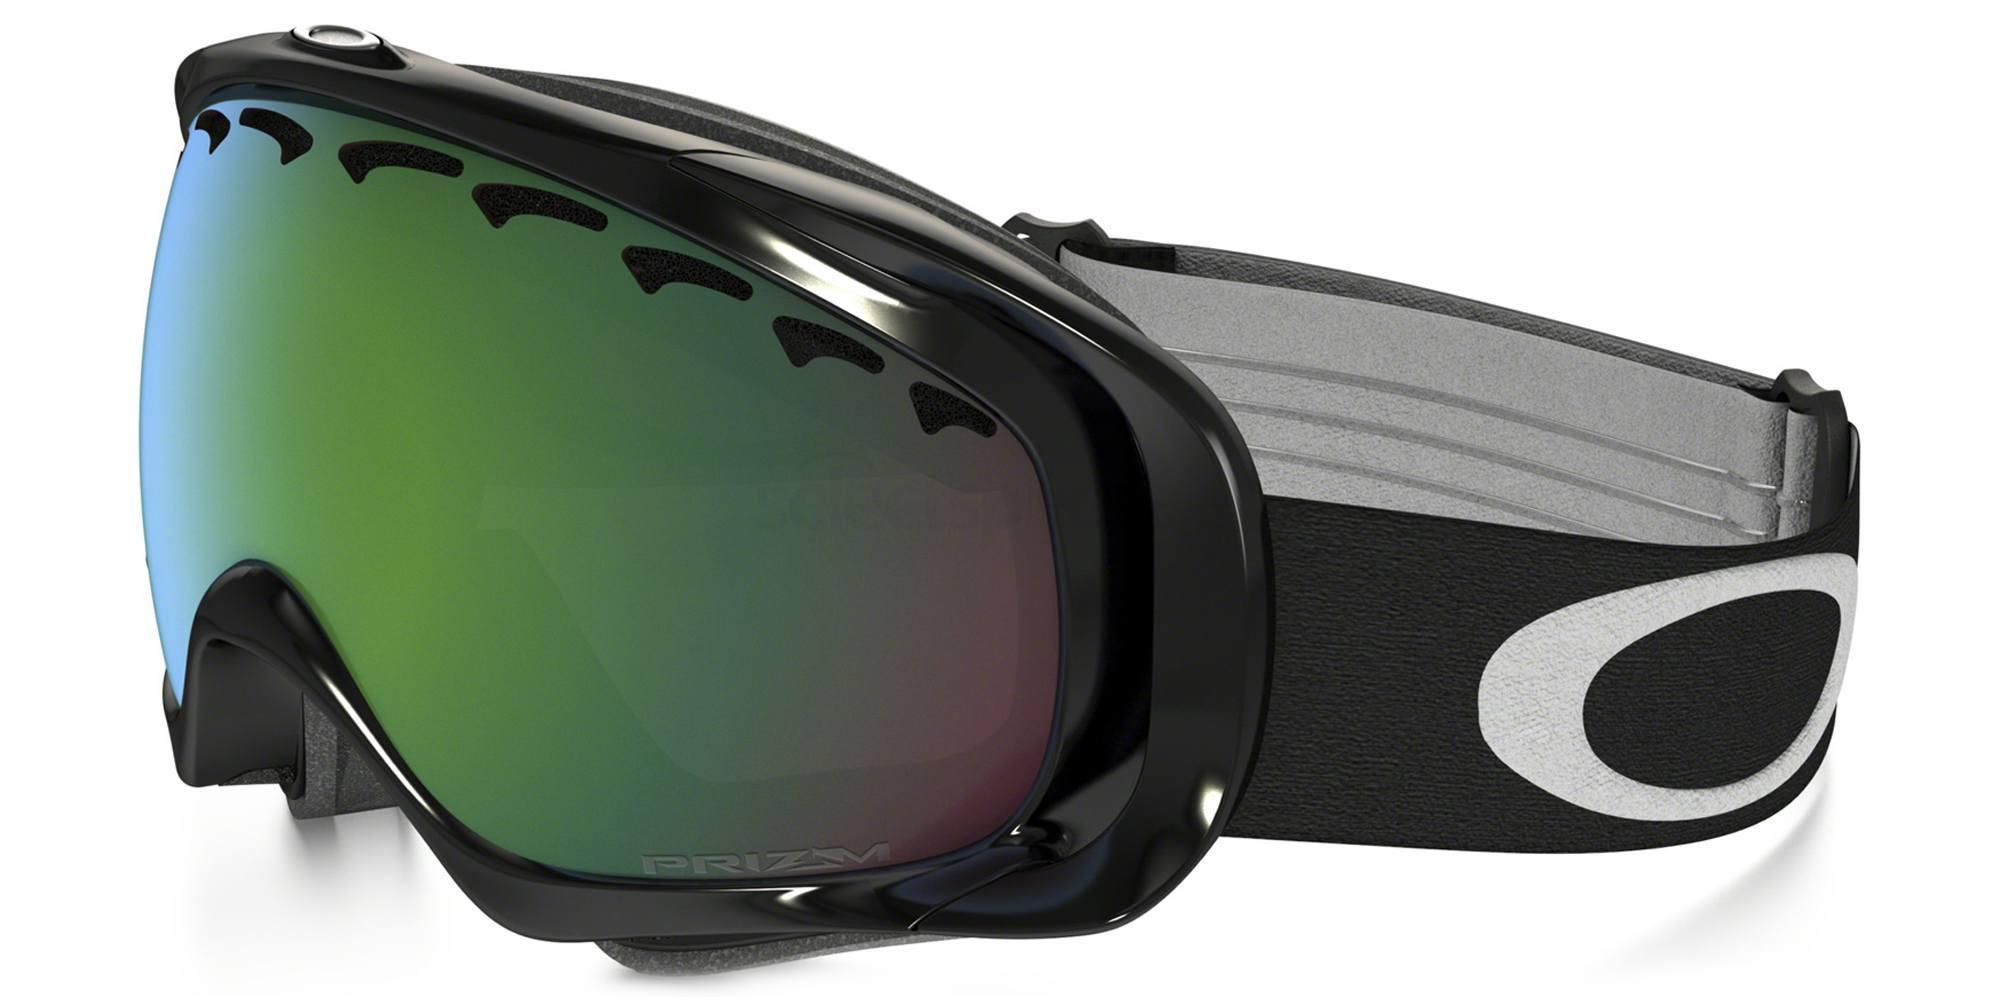 Oakley OO7005N Crowbar goggles